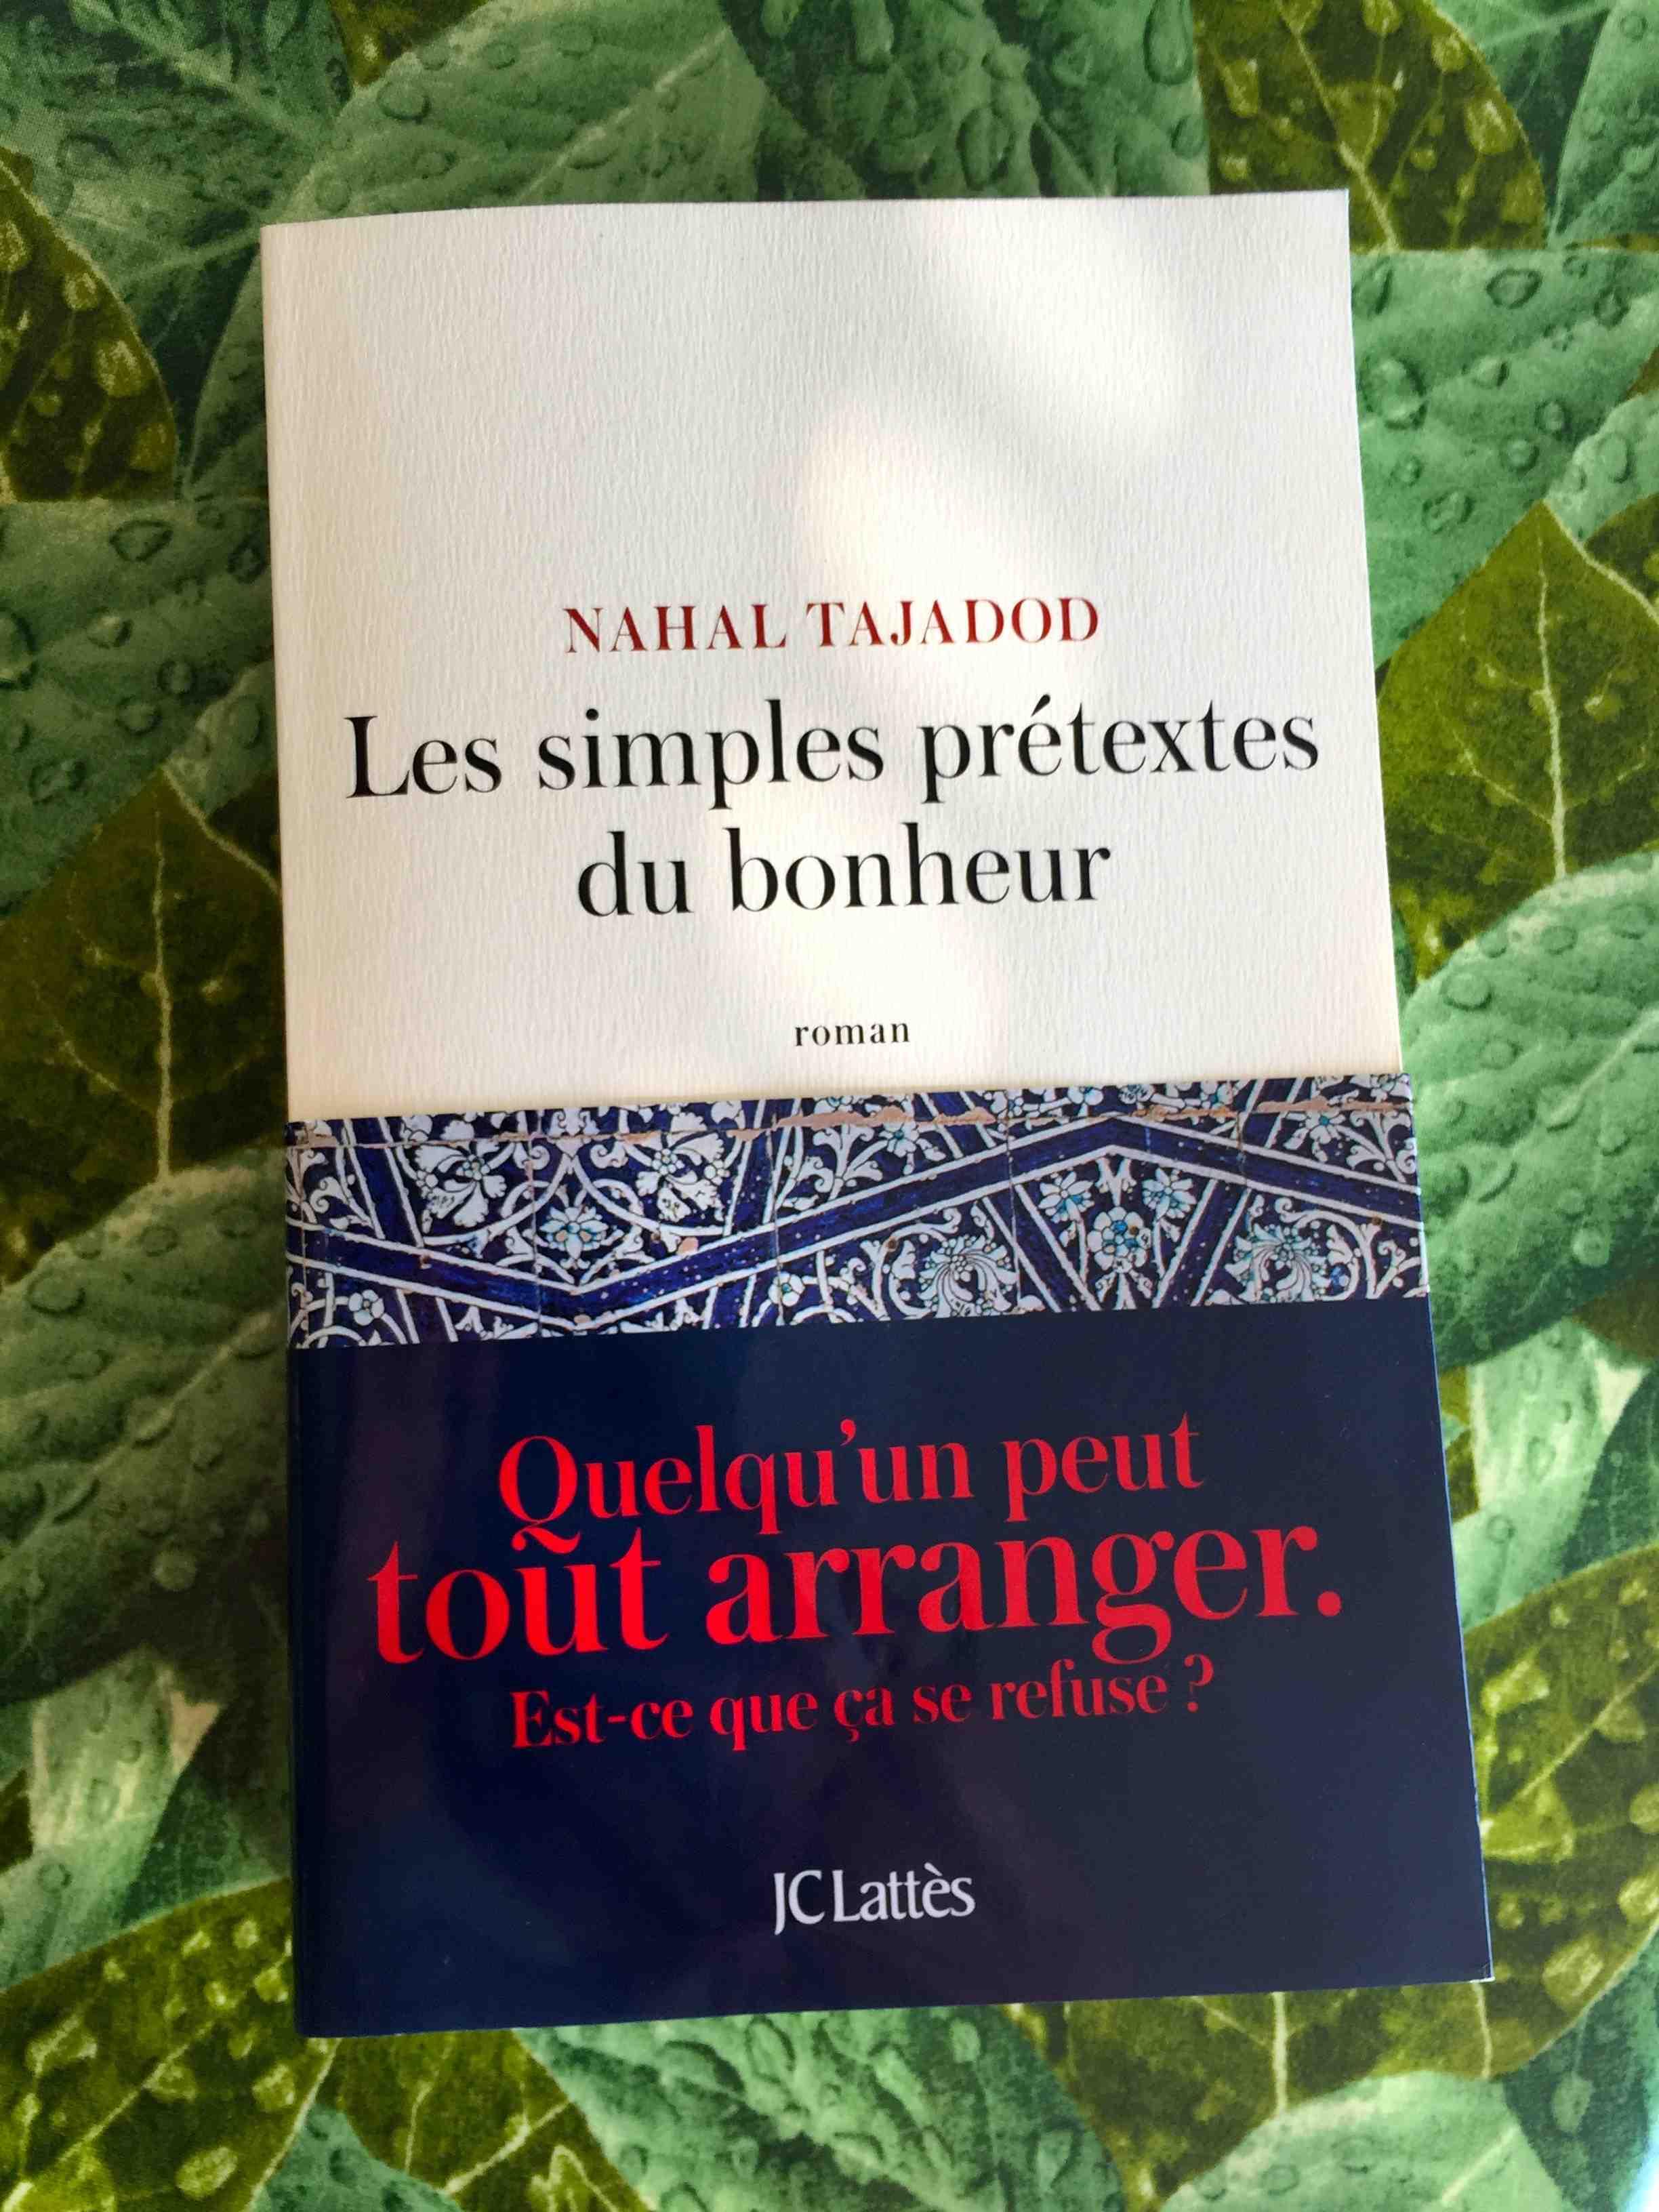 Nahal Tajadod